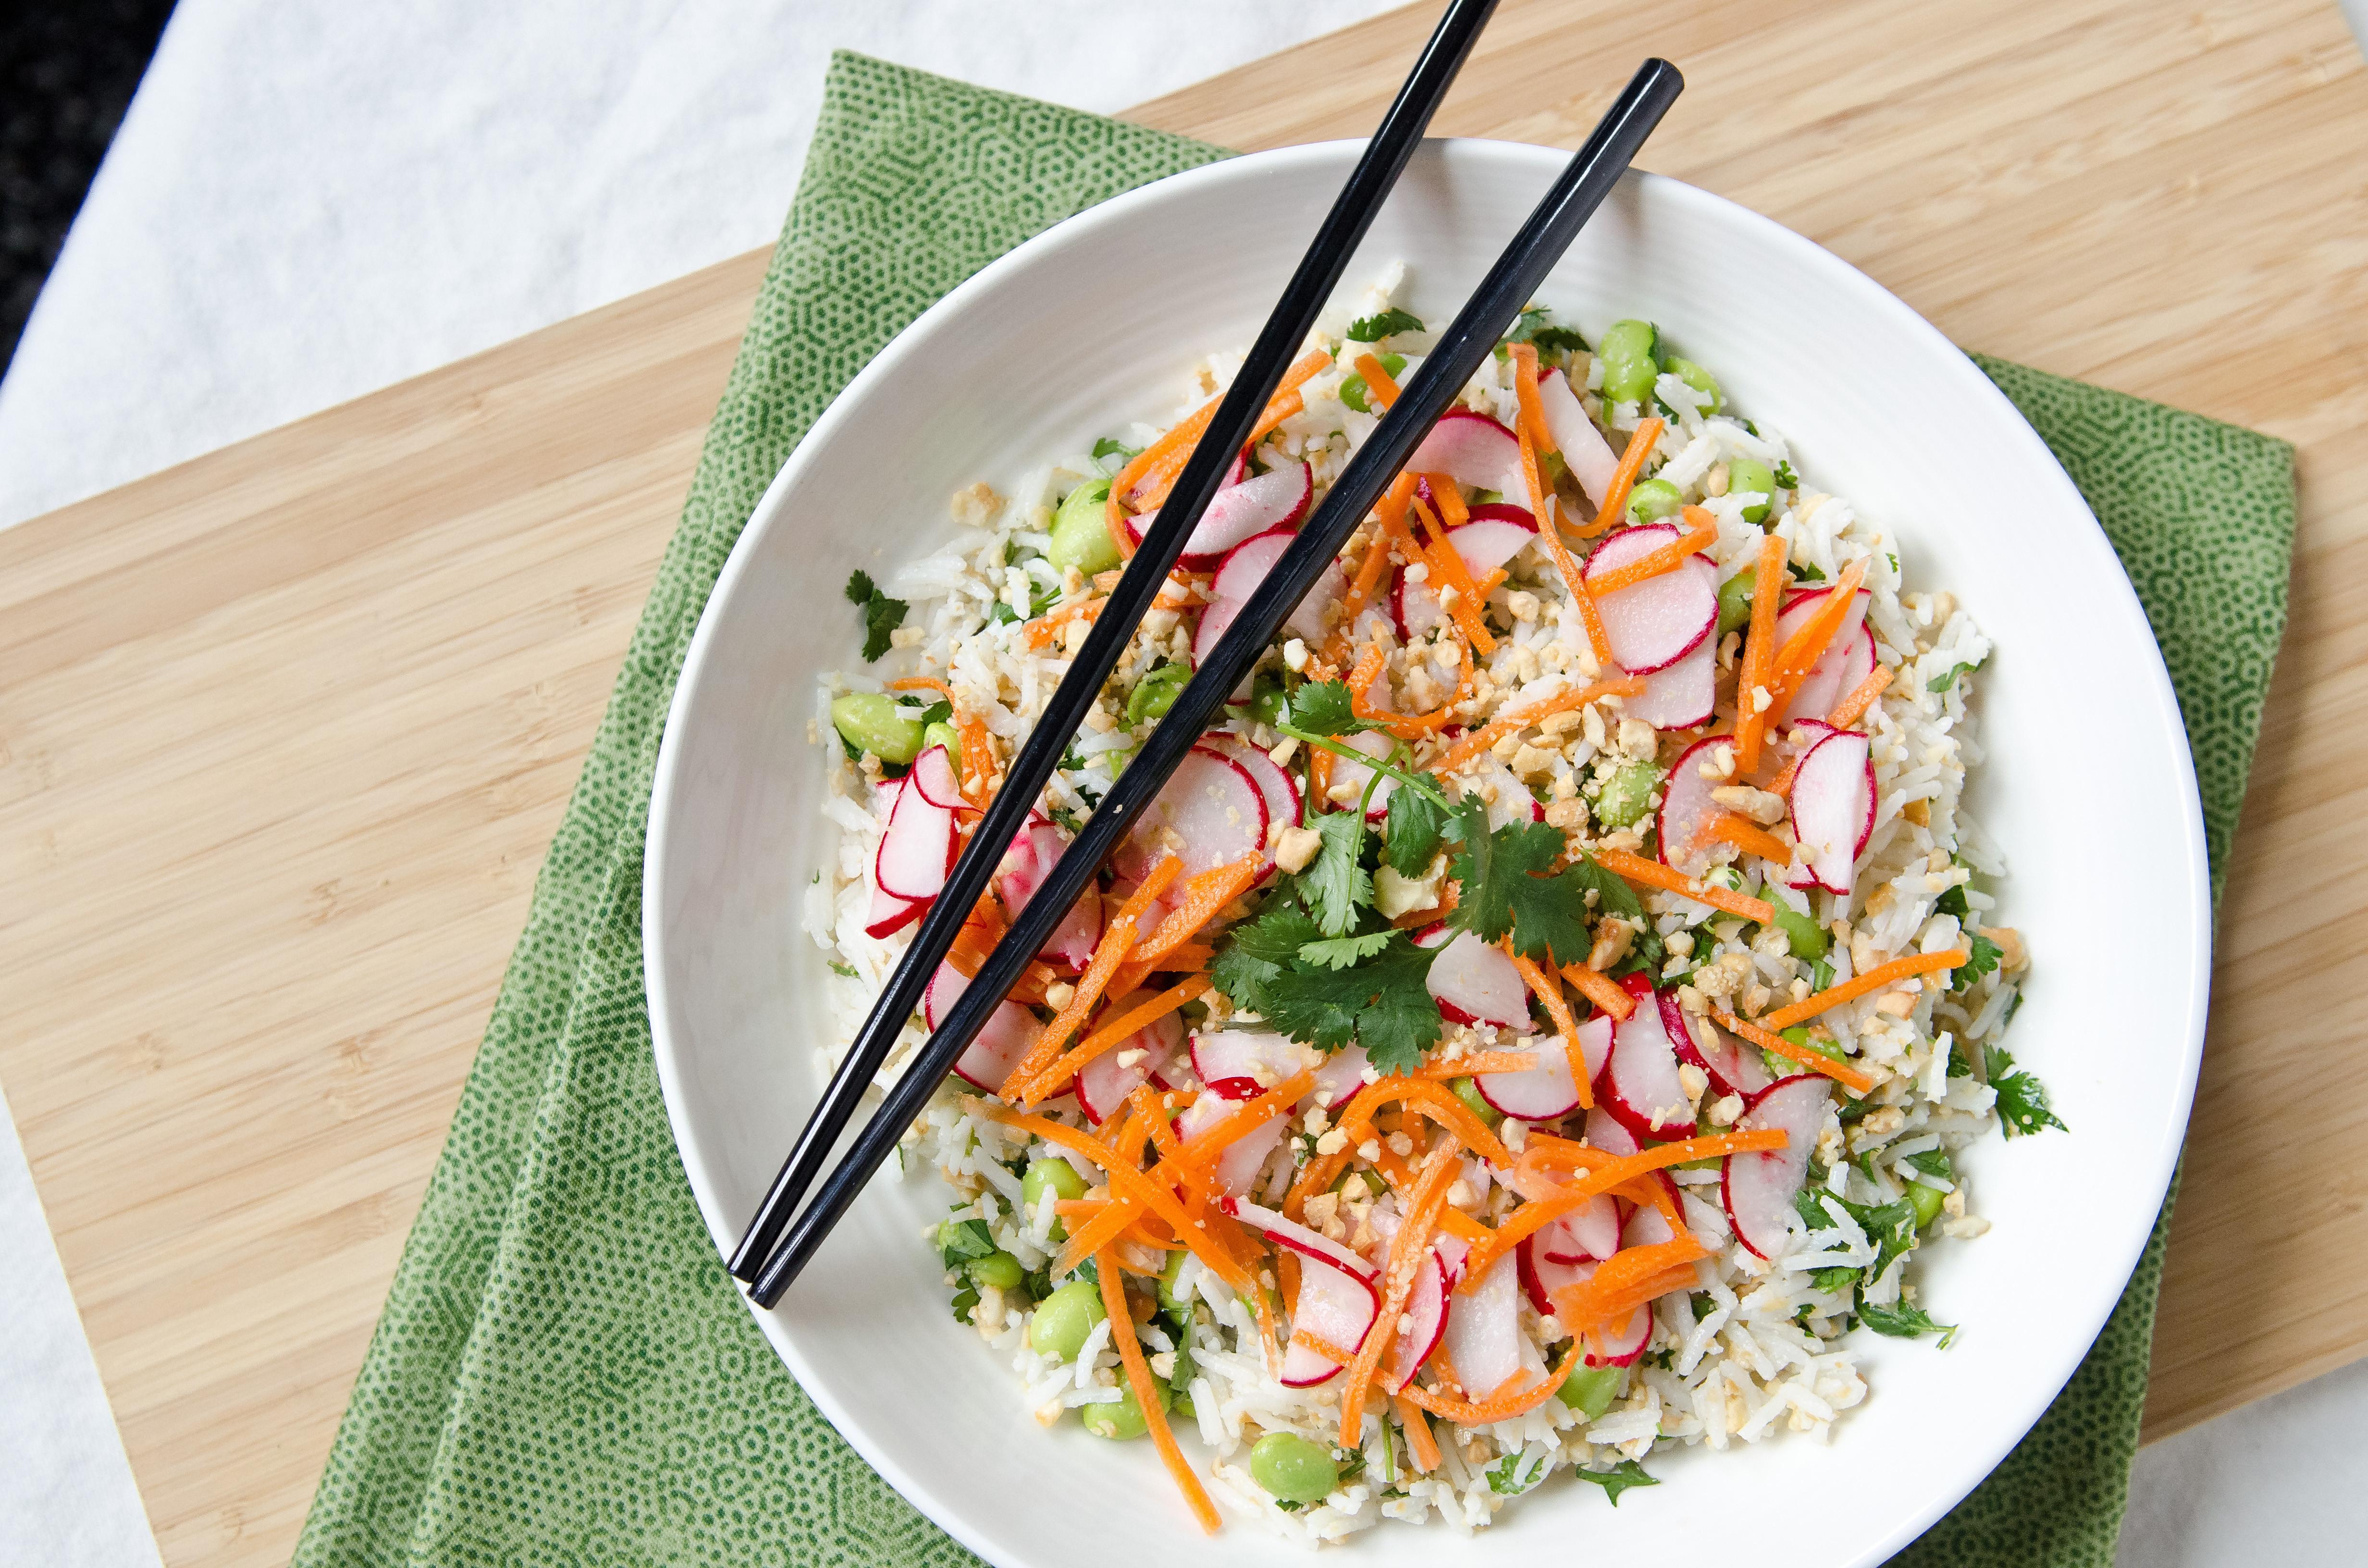 Healthy Vegan Lunch Recipes  40 Healthy Vegan Lunch Ideas The Fig Tree